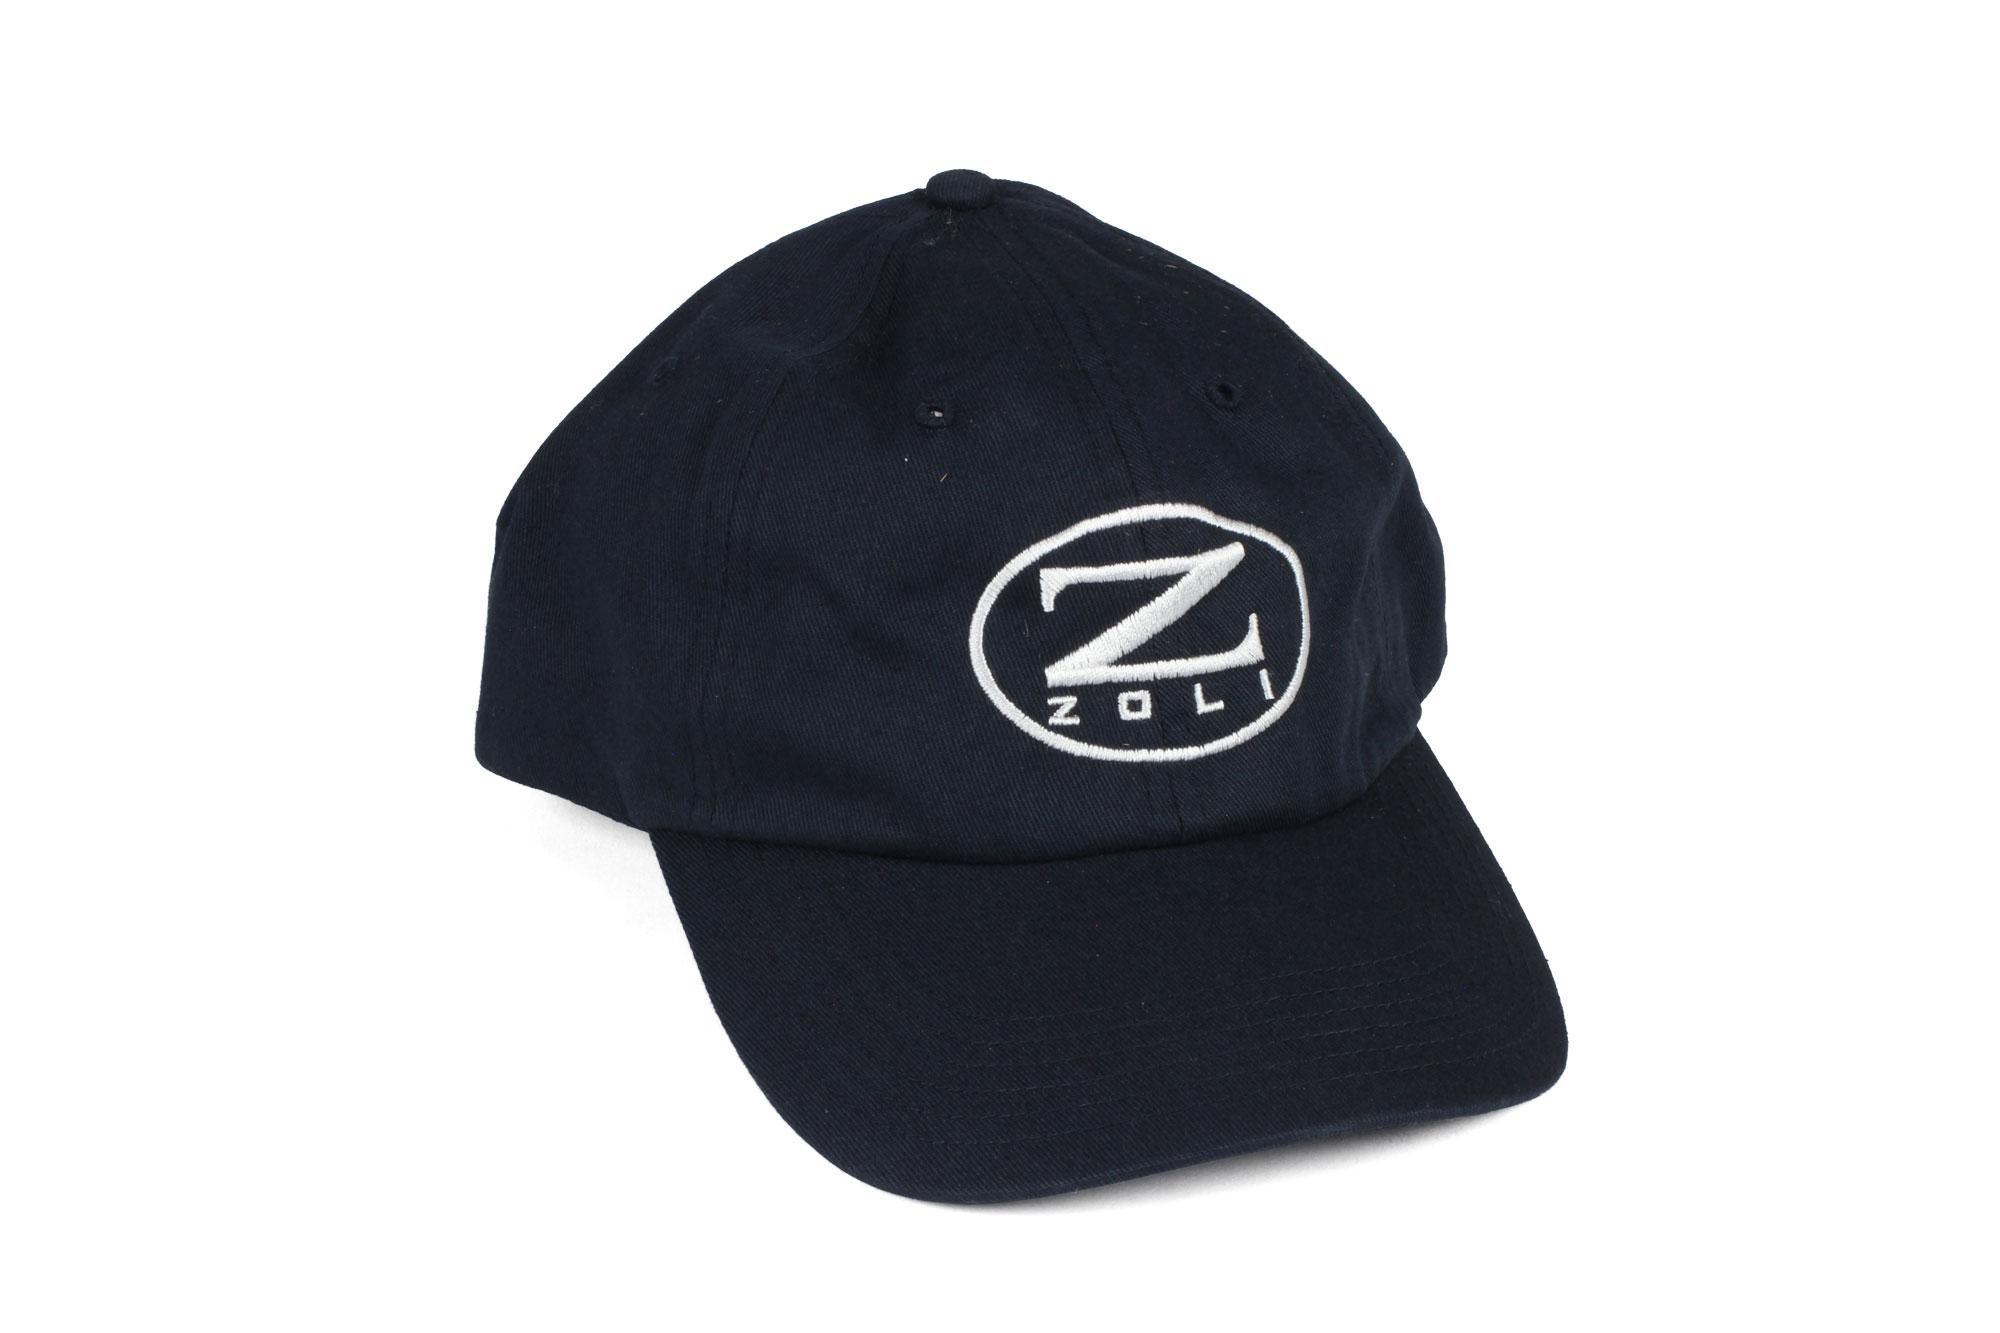 Zoli Navy Unstructured Hat